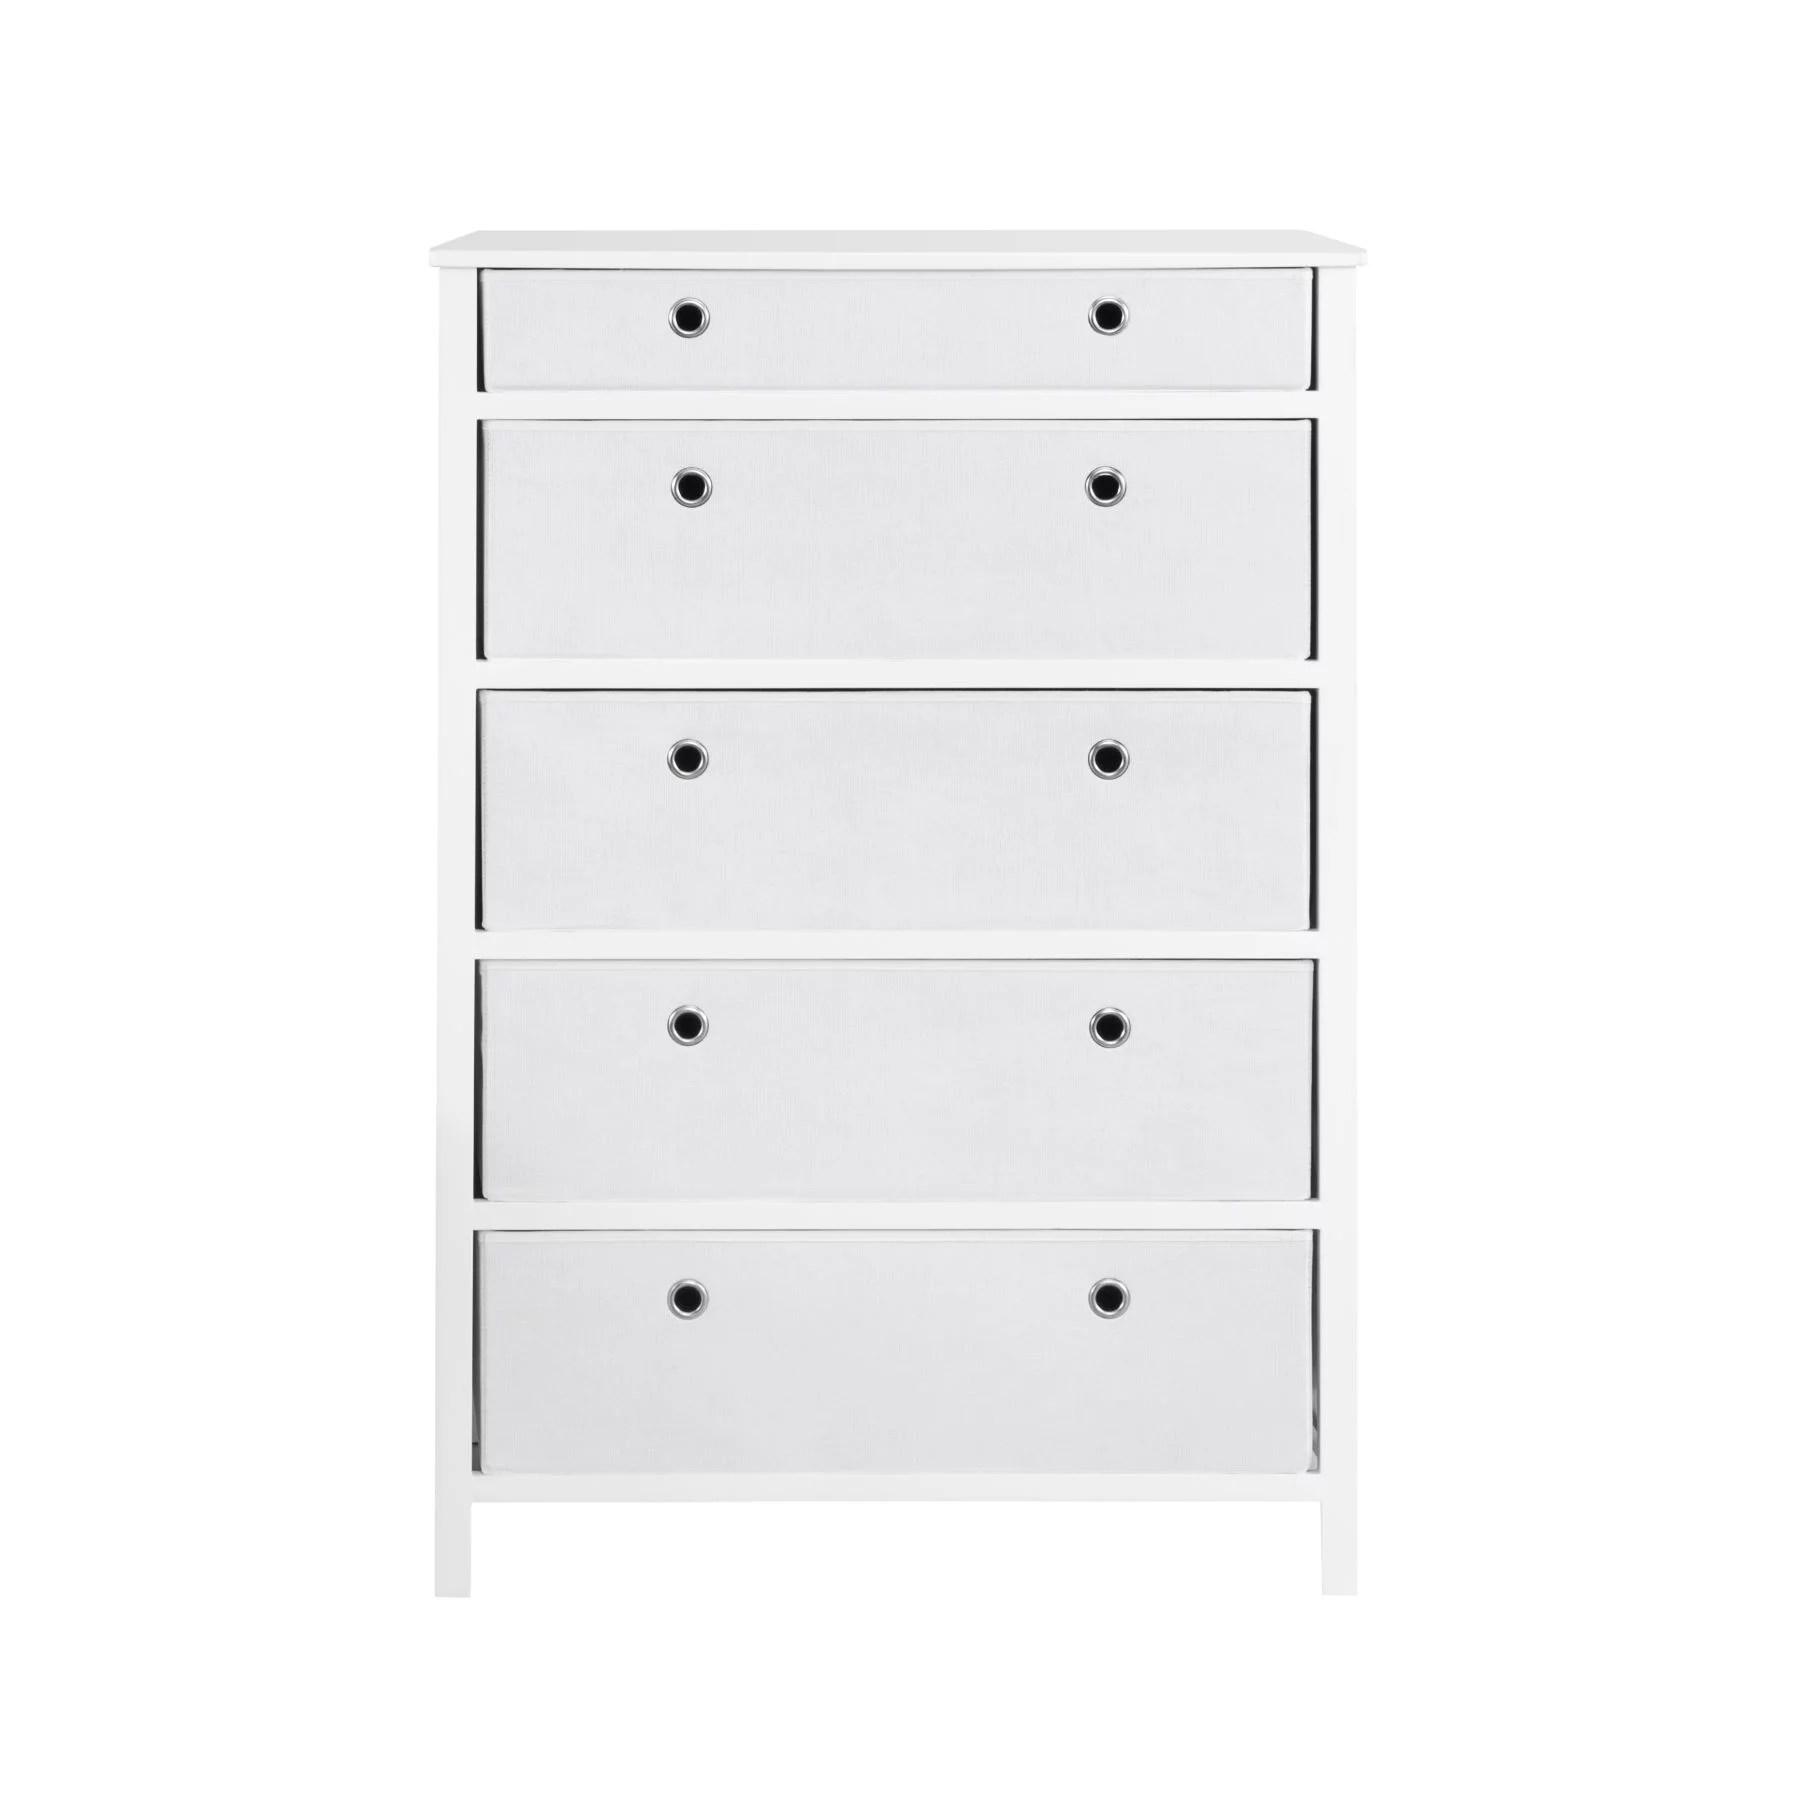 traditional elegance ezhome foldable furniture 5 drawer tall dresser 45 x 31 x 19 white